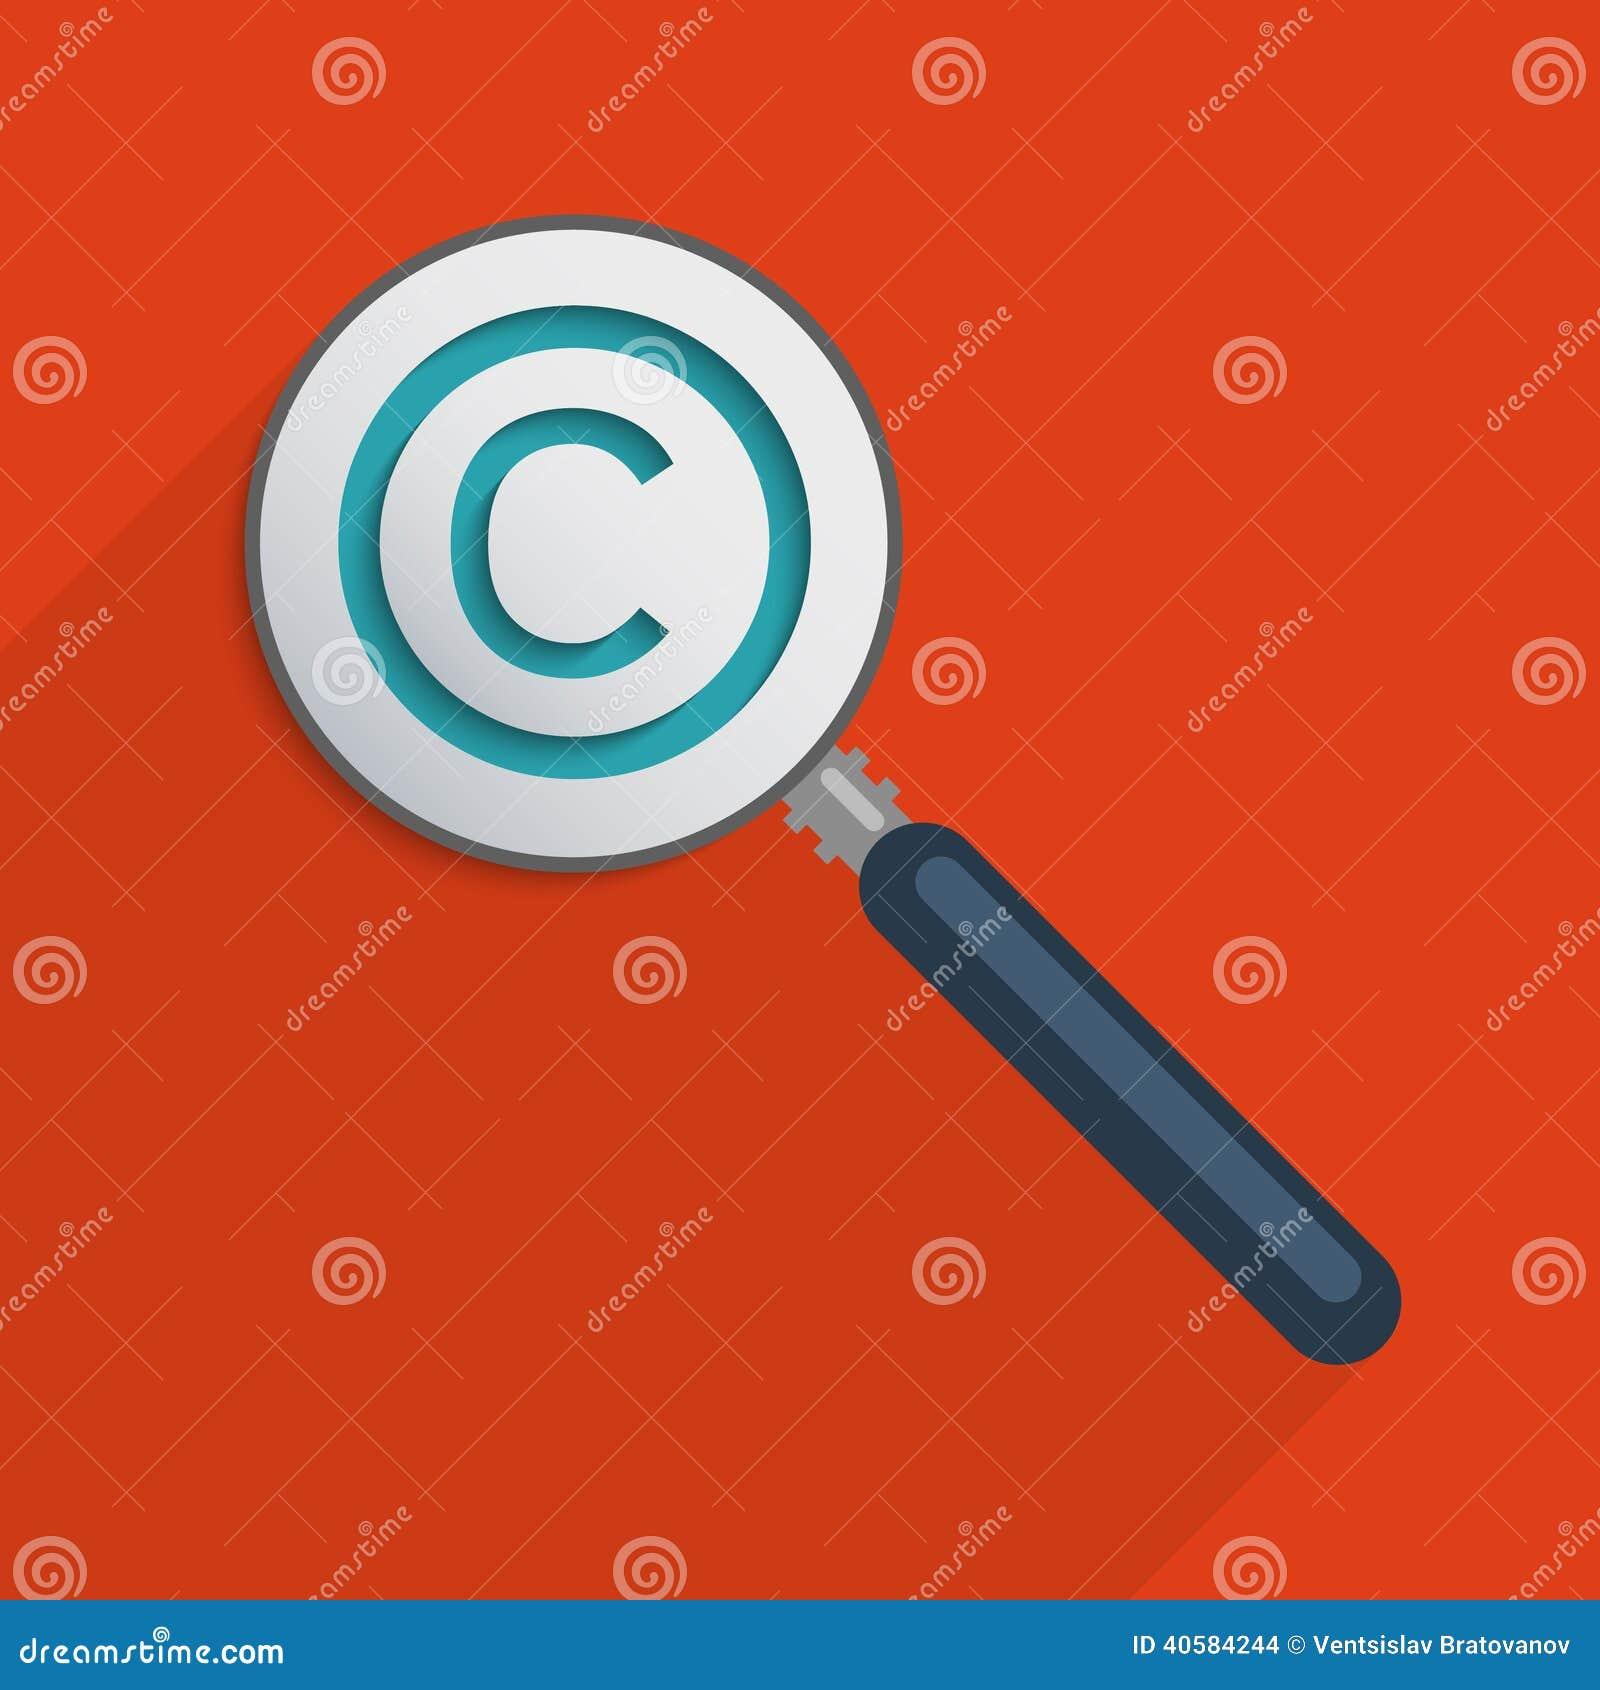 Intellectual Property Cartoon: Copyright Protection Design Flat Vector Illustration